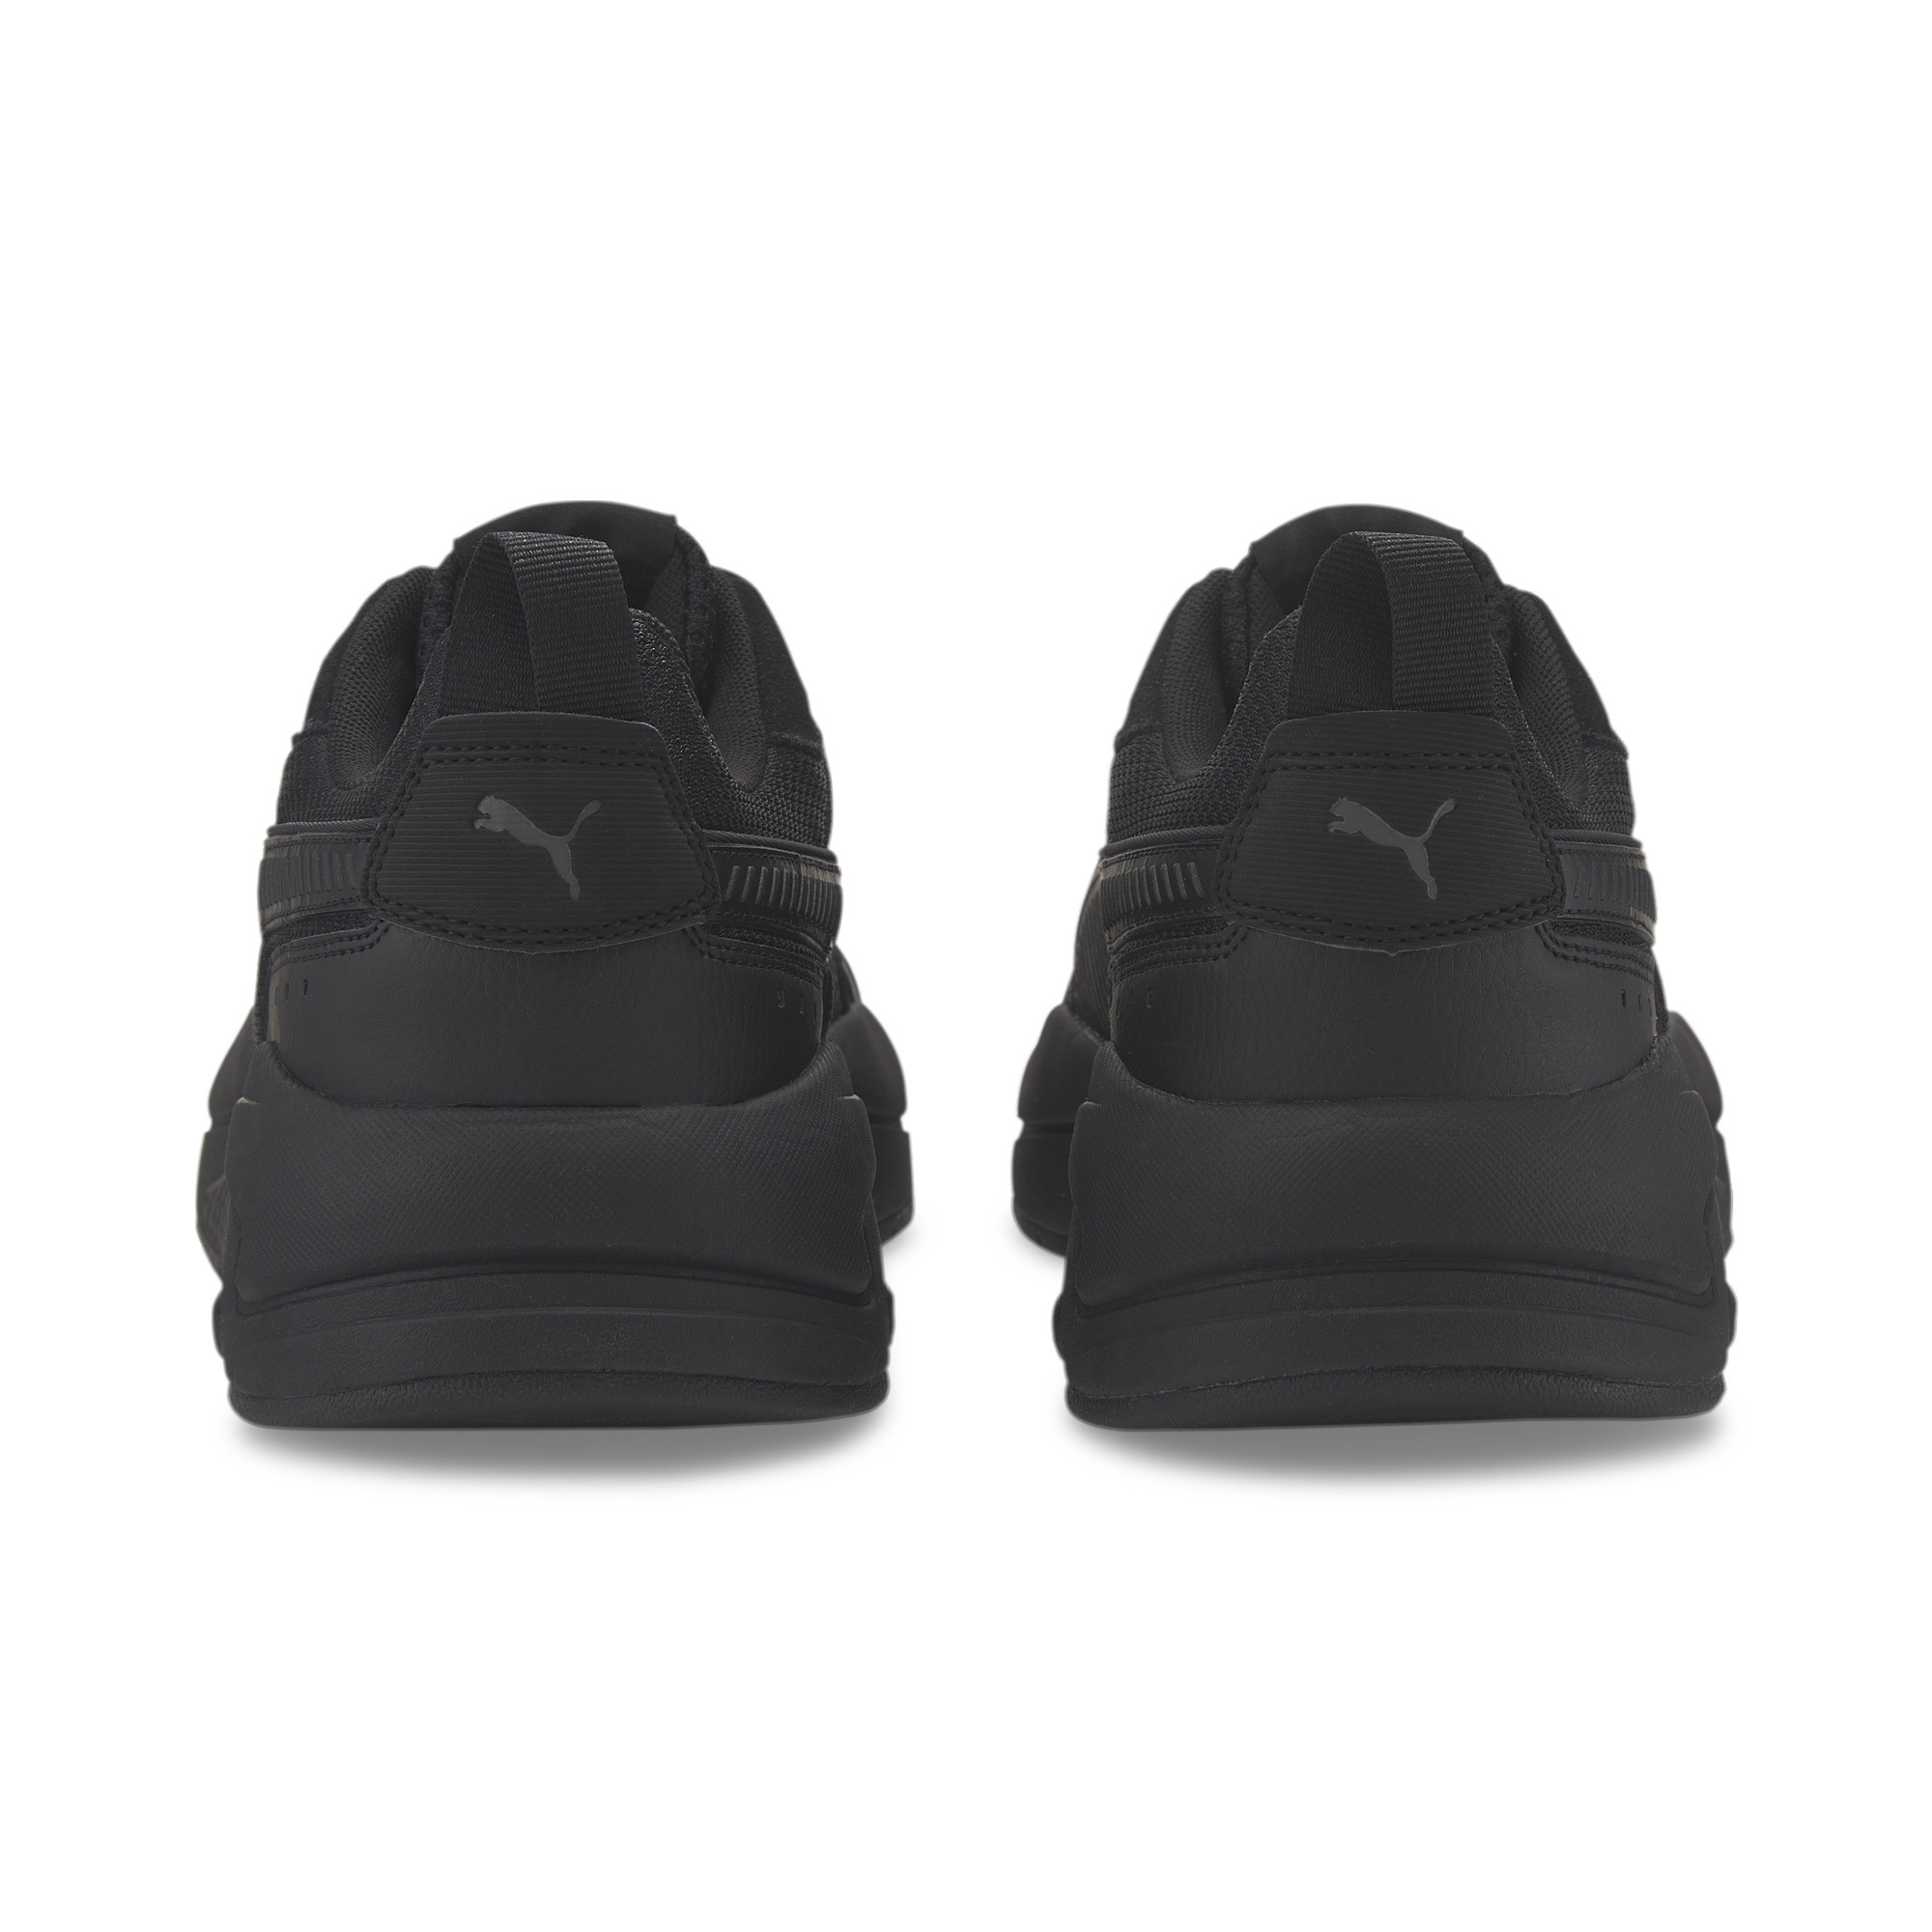 PUMA-Men-039-s-X-RAY-Sneakers thumbnail 17